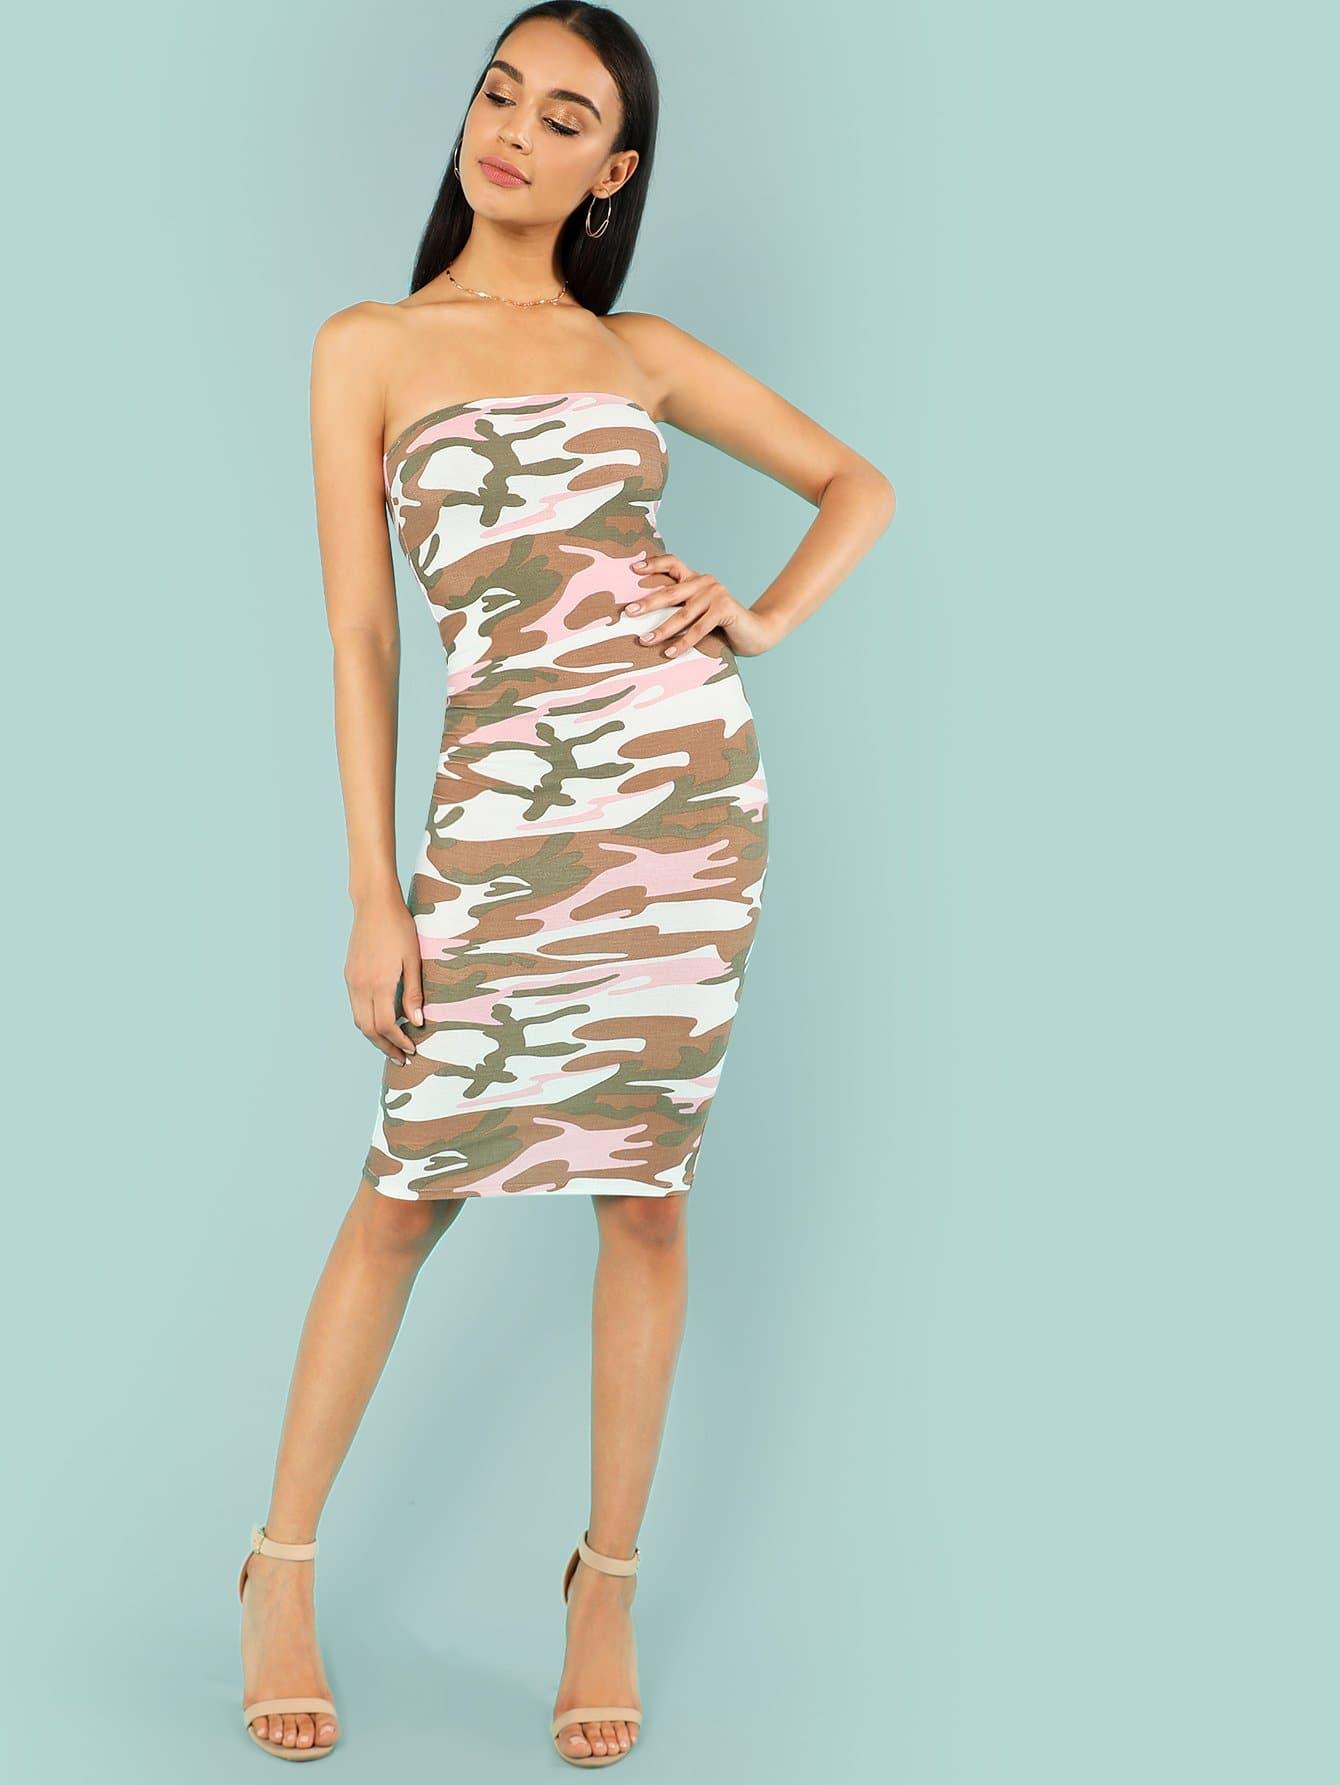 Camo Print Strapless Bodycon Dress camo print night dress